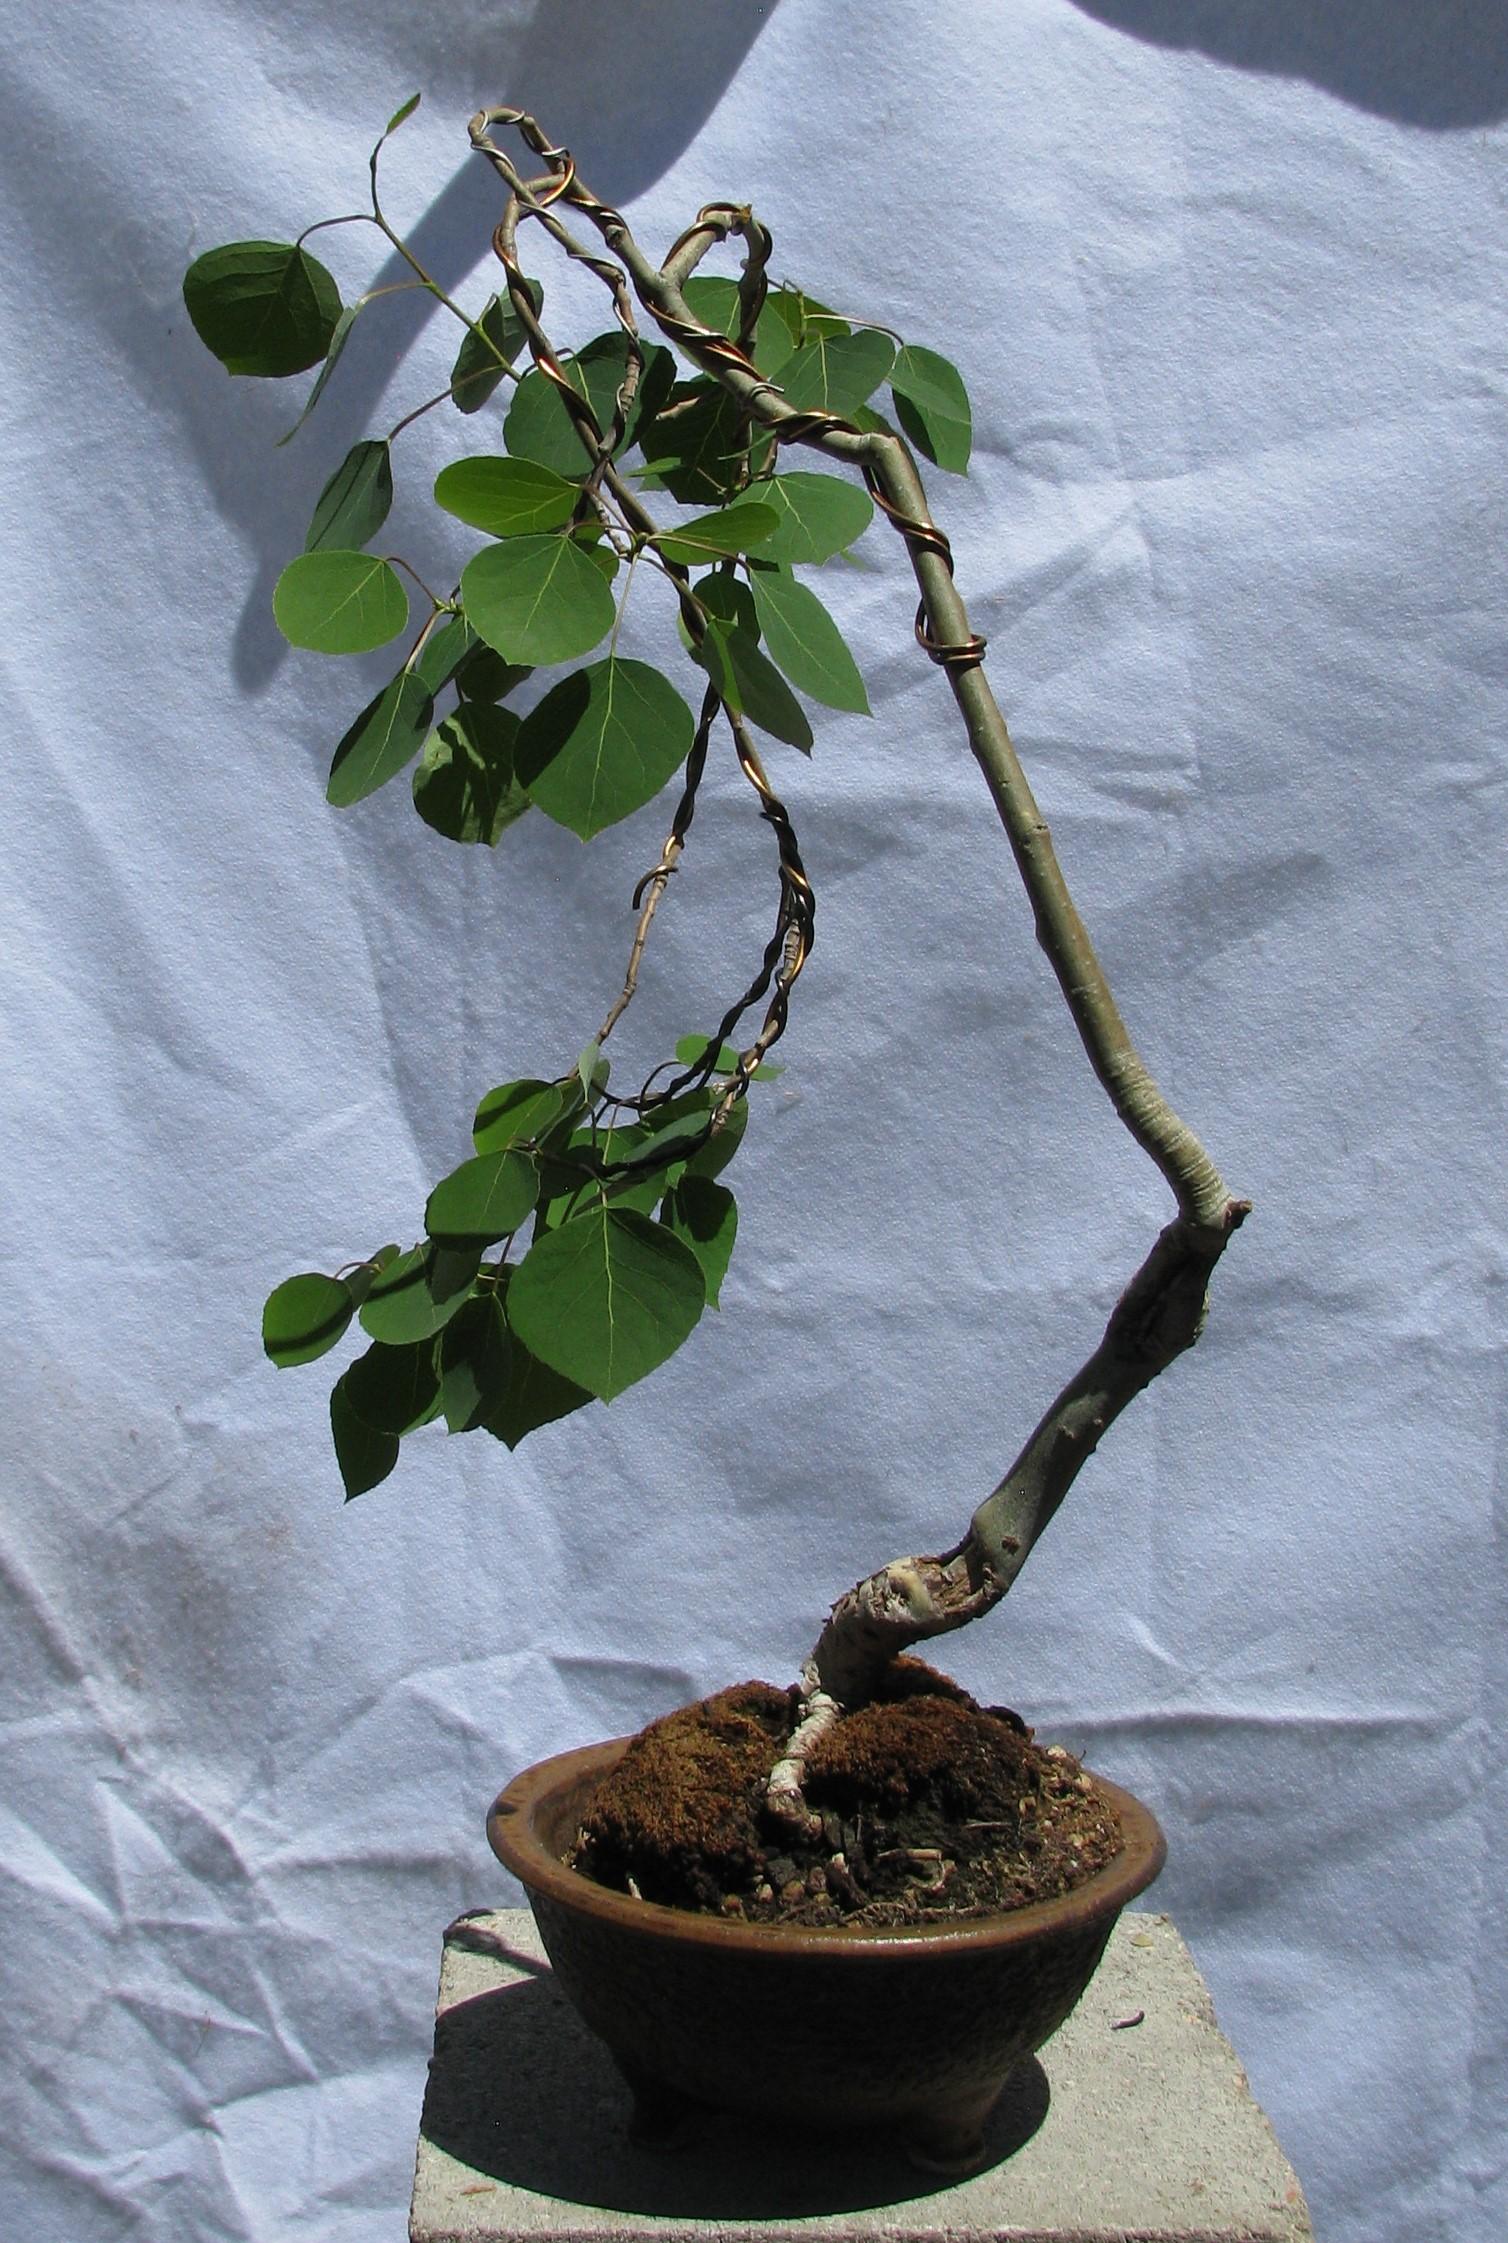 Populus Tremuloides Aspen Colorado Rocky Mountain Bonsai Suiseki